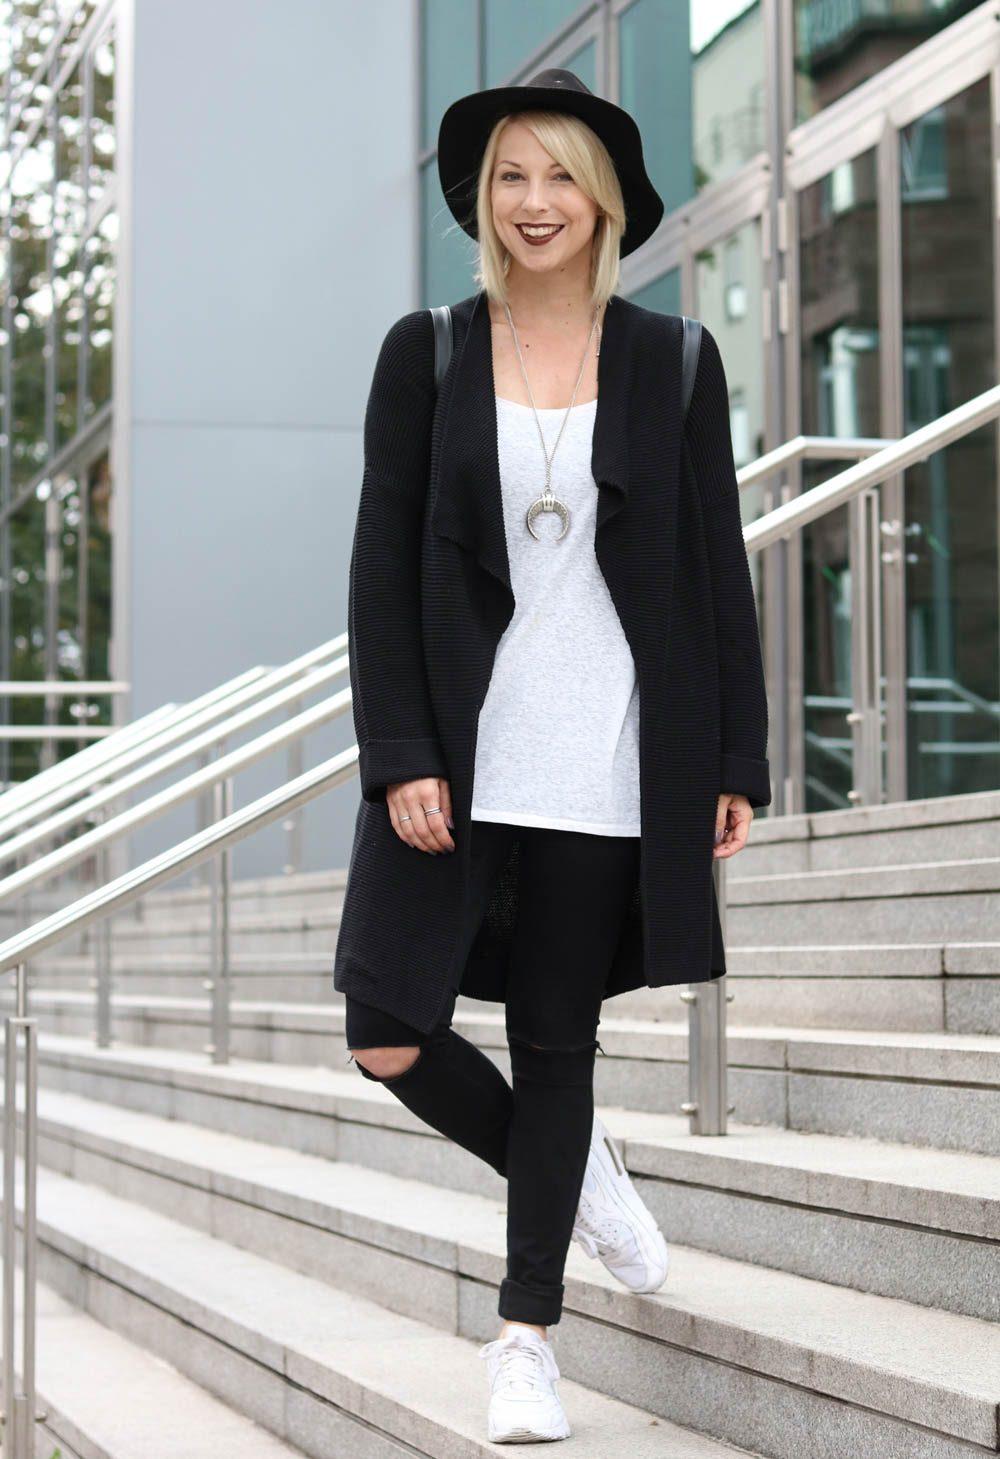 fashionblogger-mannheim-outfit-longcardigan-nike-air-max-skinnyjeans-rucksack-4-von-20